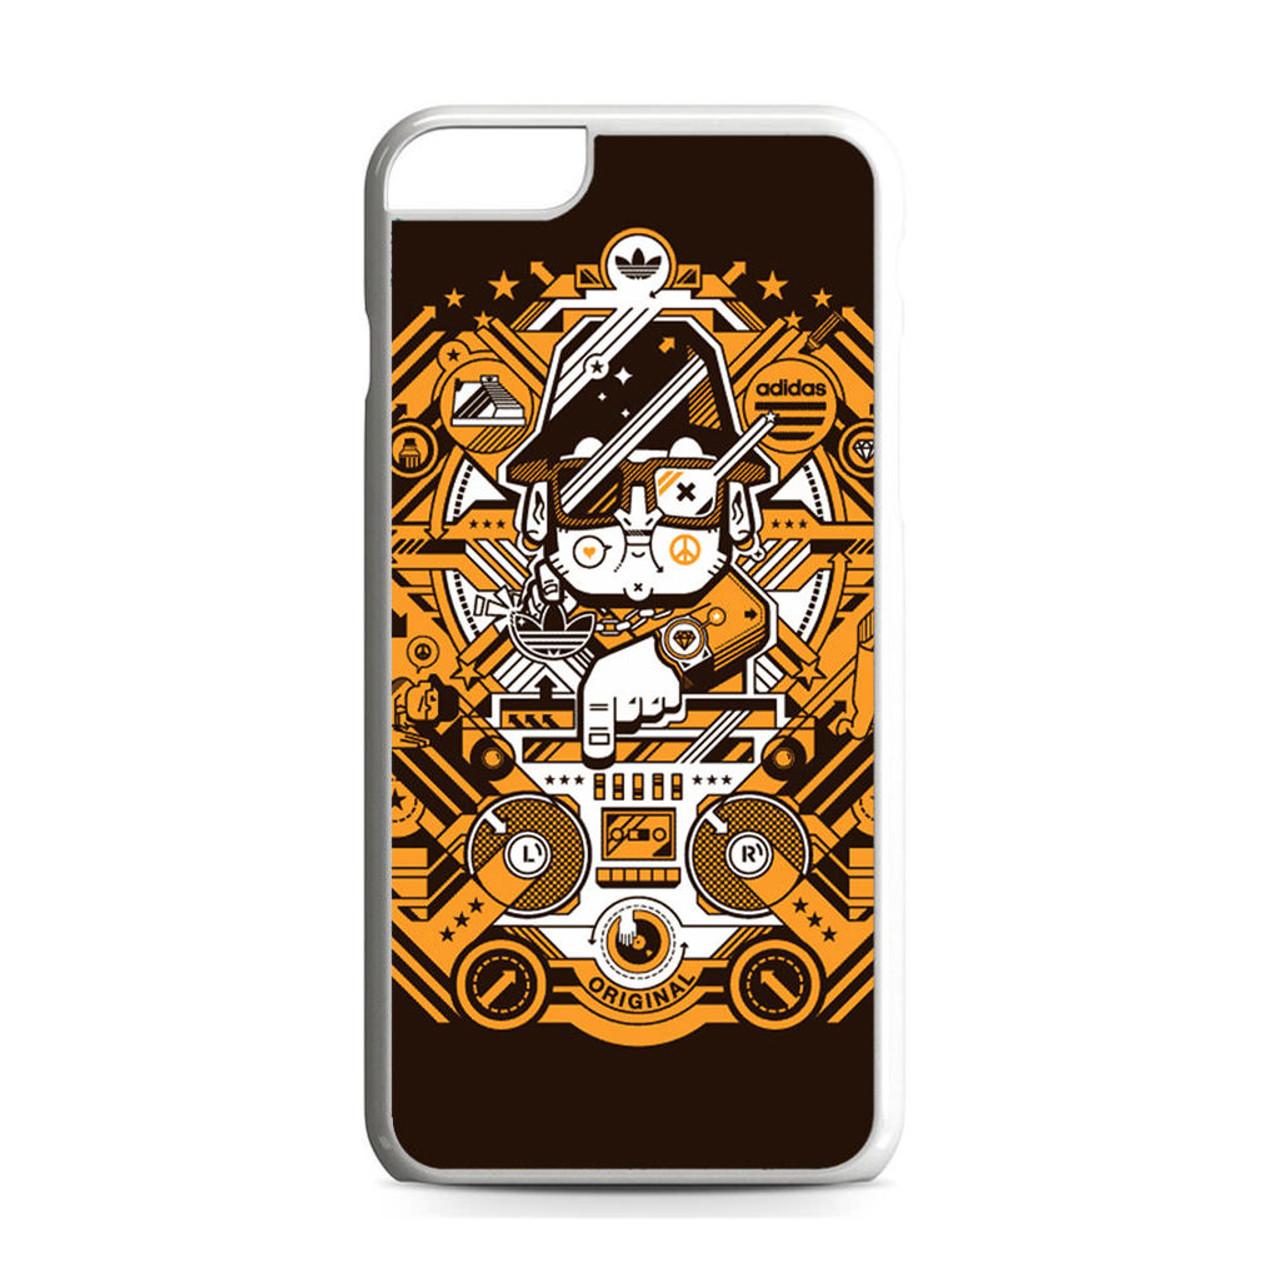 Oh querido recoger Terapia  Adidas Style iPhone 6 Plus/6S Plus Case - GGIANS